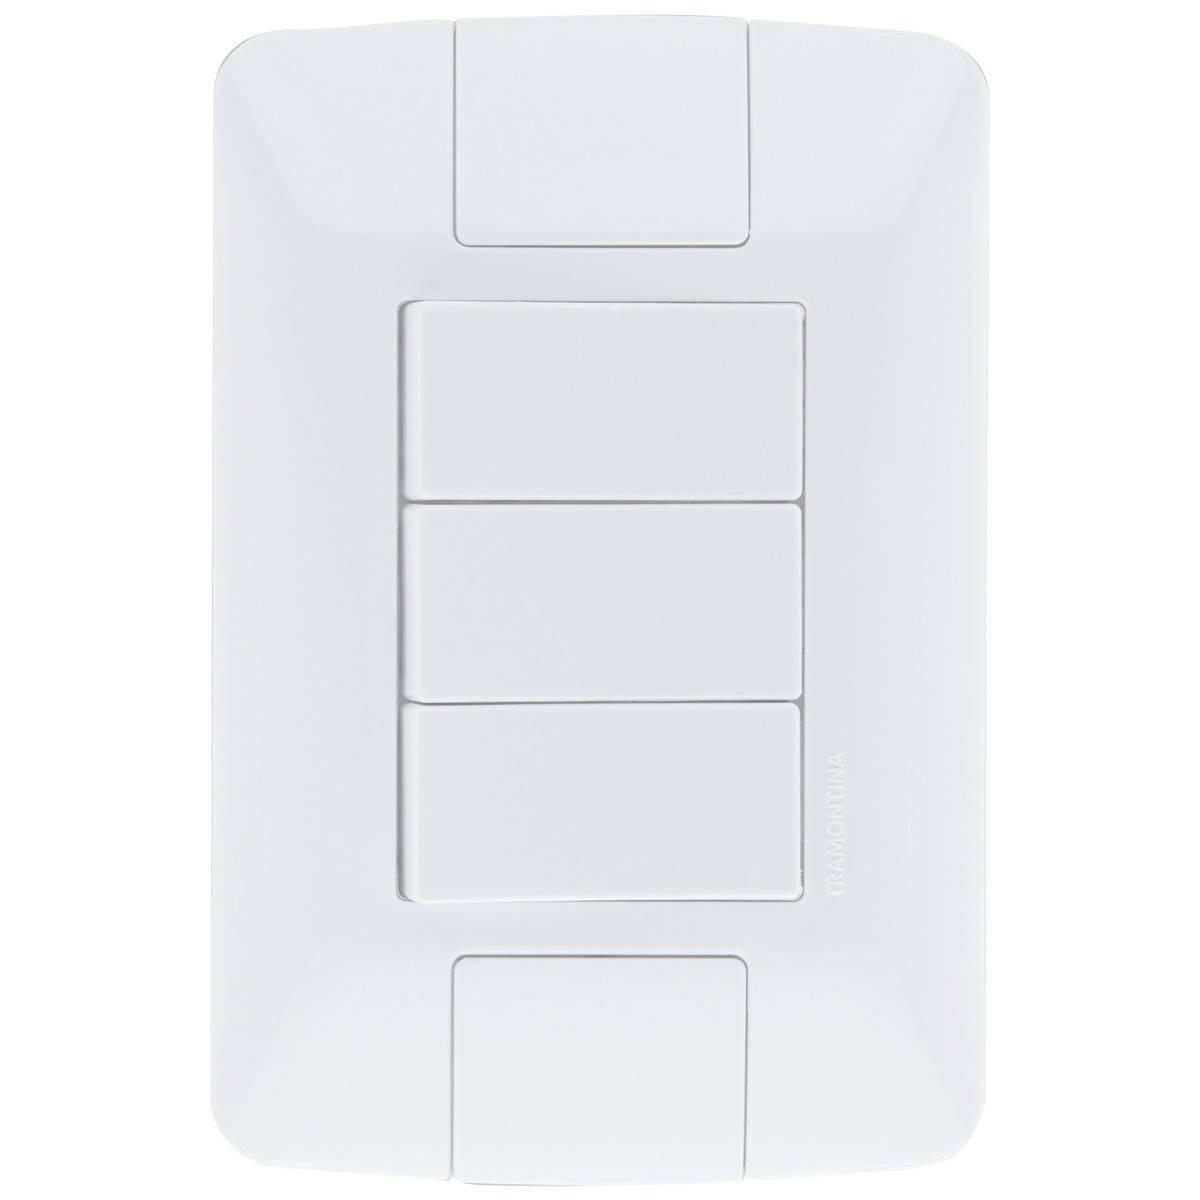 Conjunto Montado Aria 4x2 3 Interruptores Simples 250V Tramo - LCGELETRO